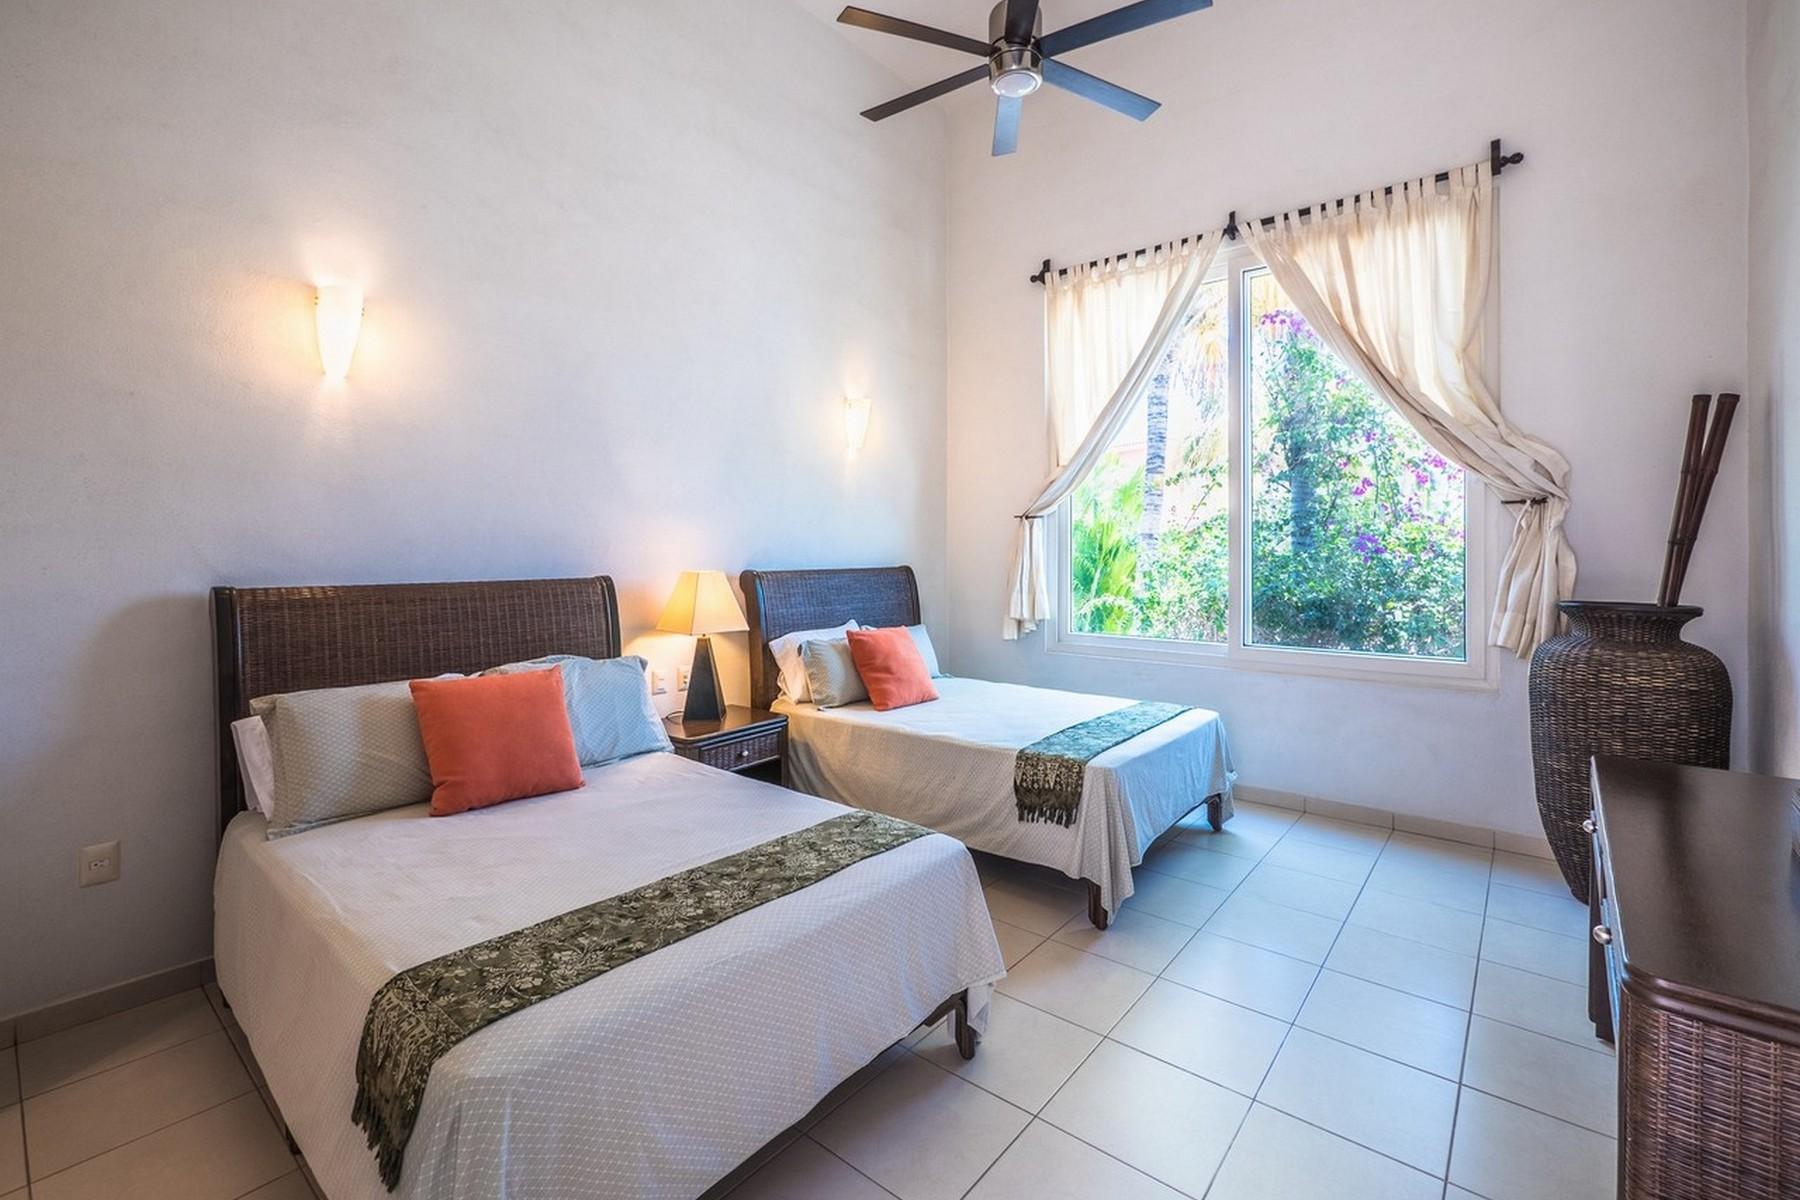 Additional photo for property listing at Casa Mariposas 124 Paseo de las Mariposas 124 Nuevo Vallarta, Nayarit 63735 Mexico